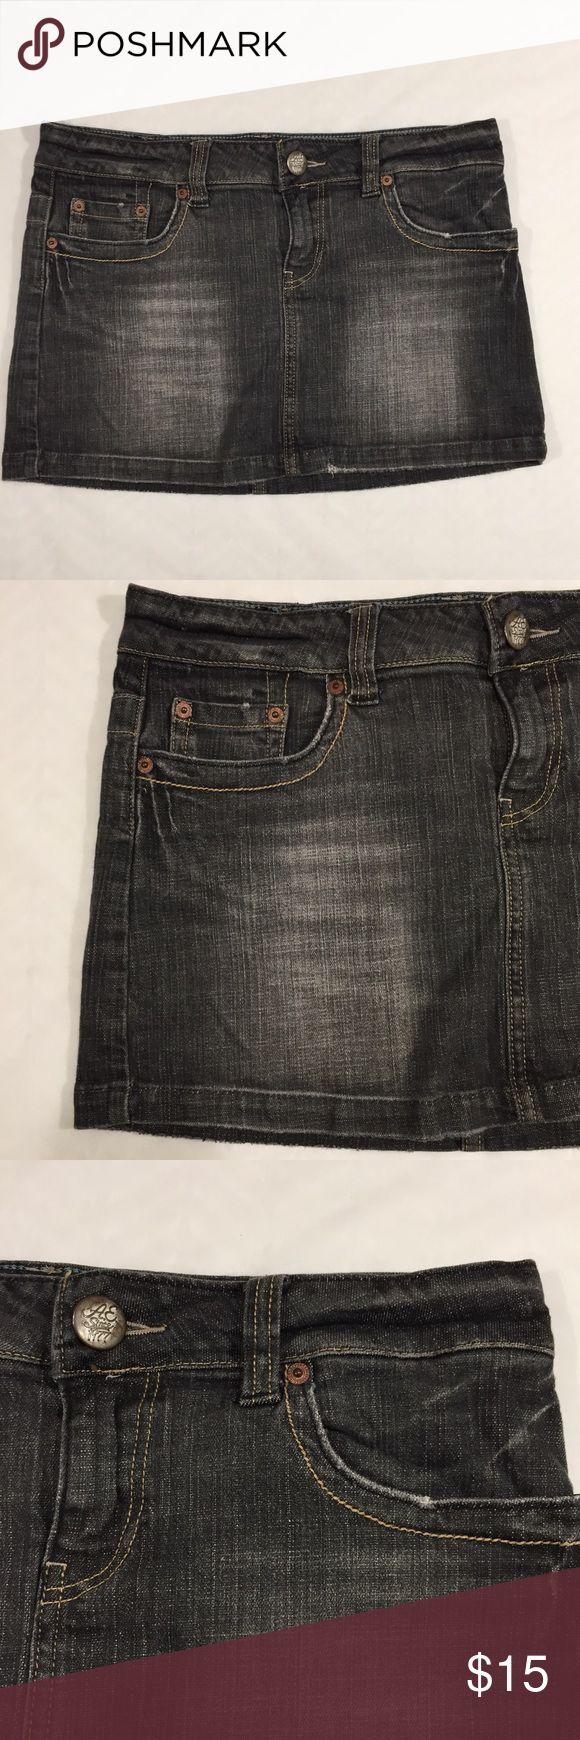 American Eagle 🦅 Mini Jean Skirt Size 8 Z American Eagle Outfitters Skirts Mini